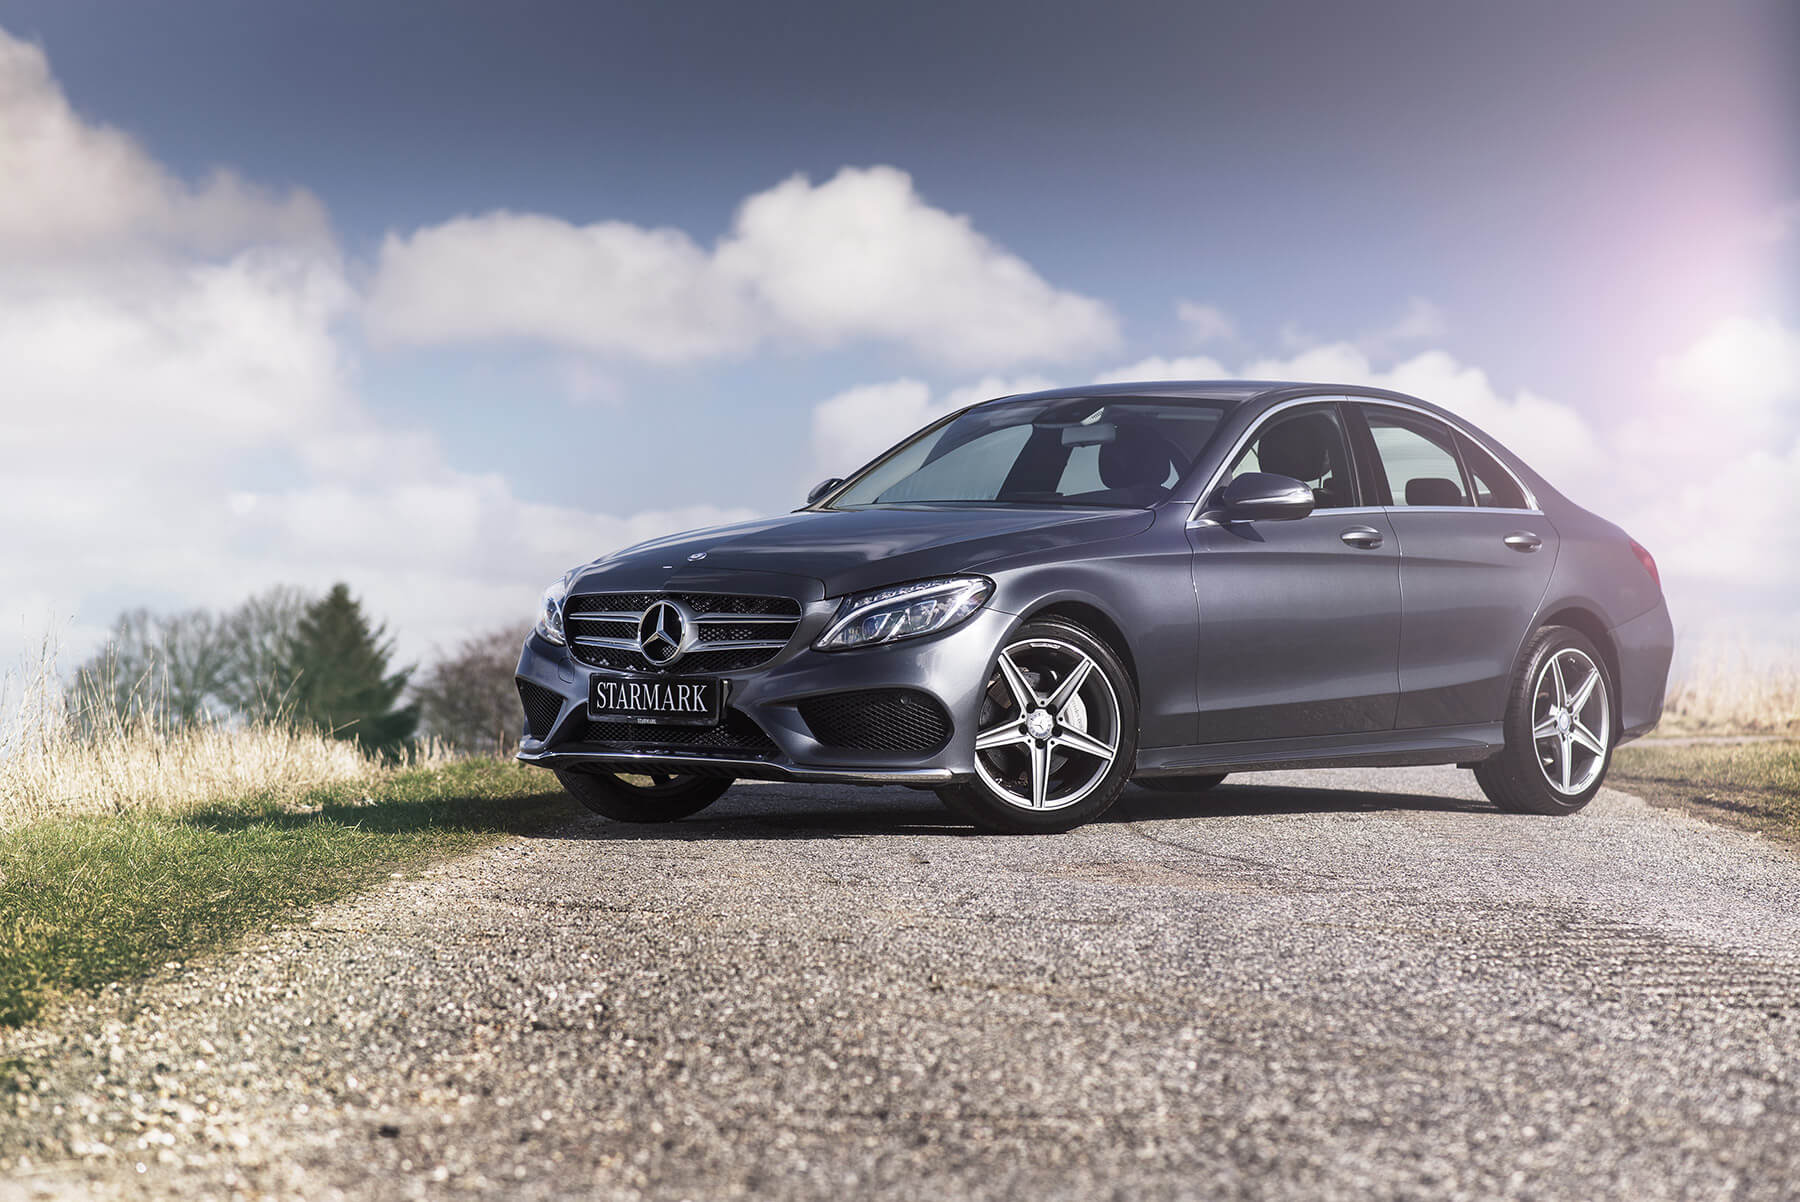 Mercedes-Benz Starmark